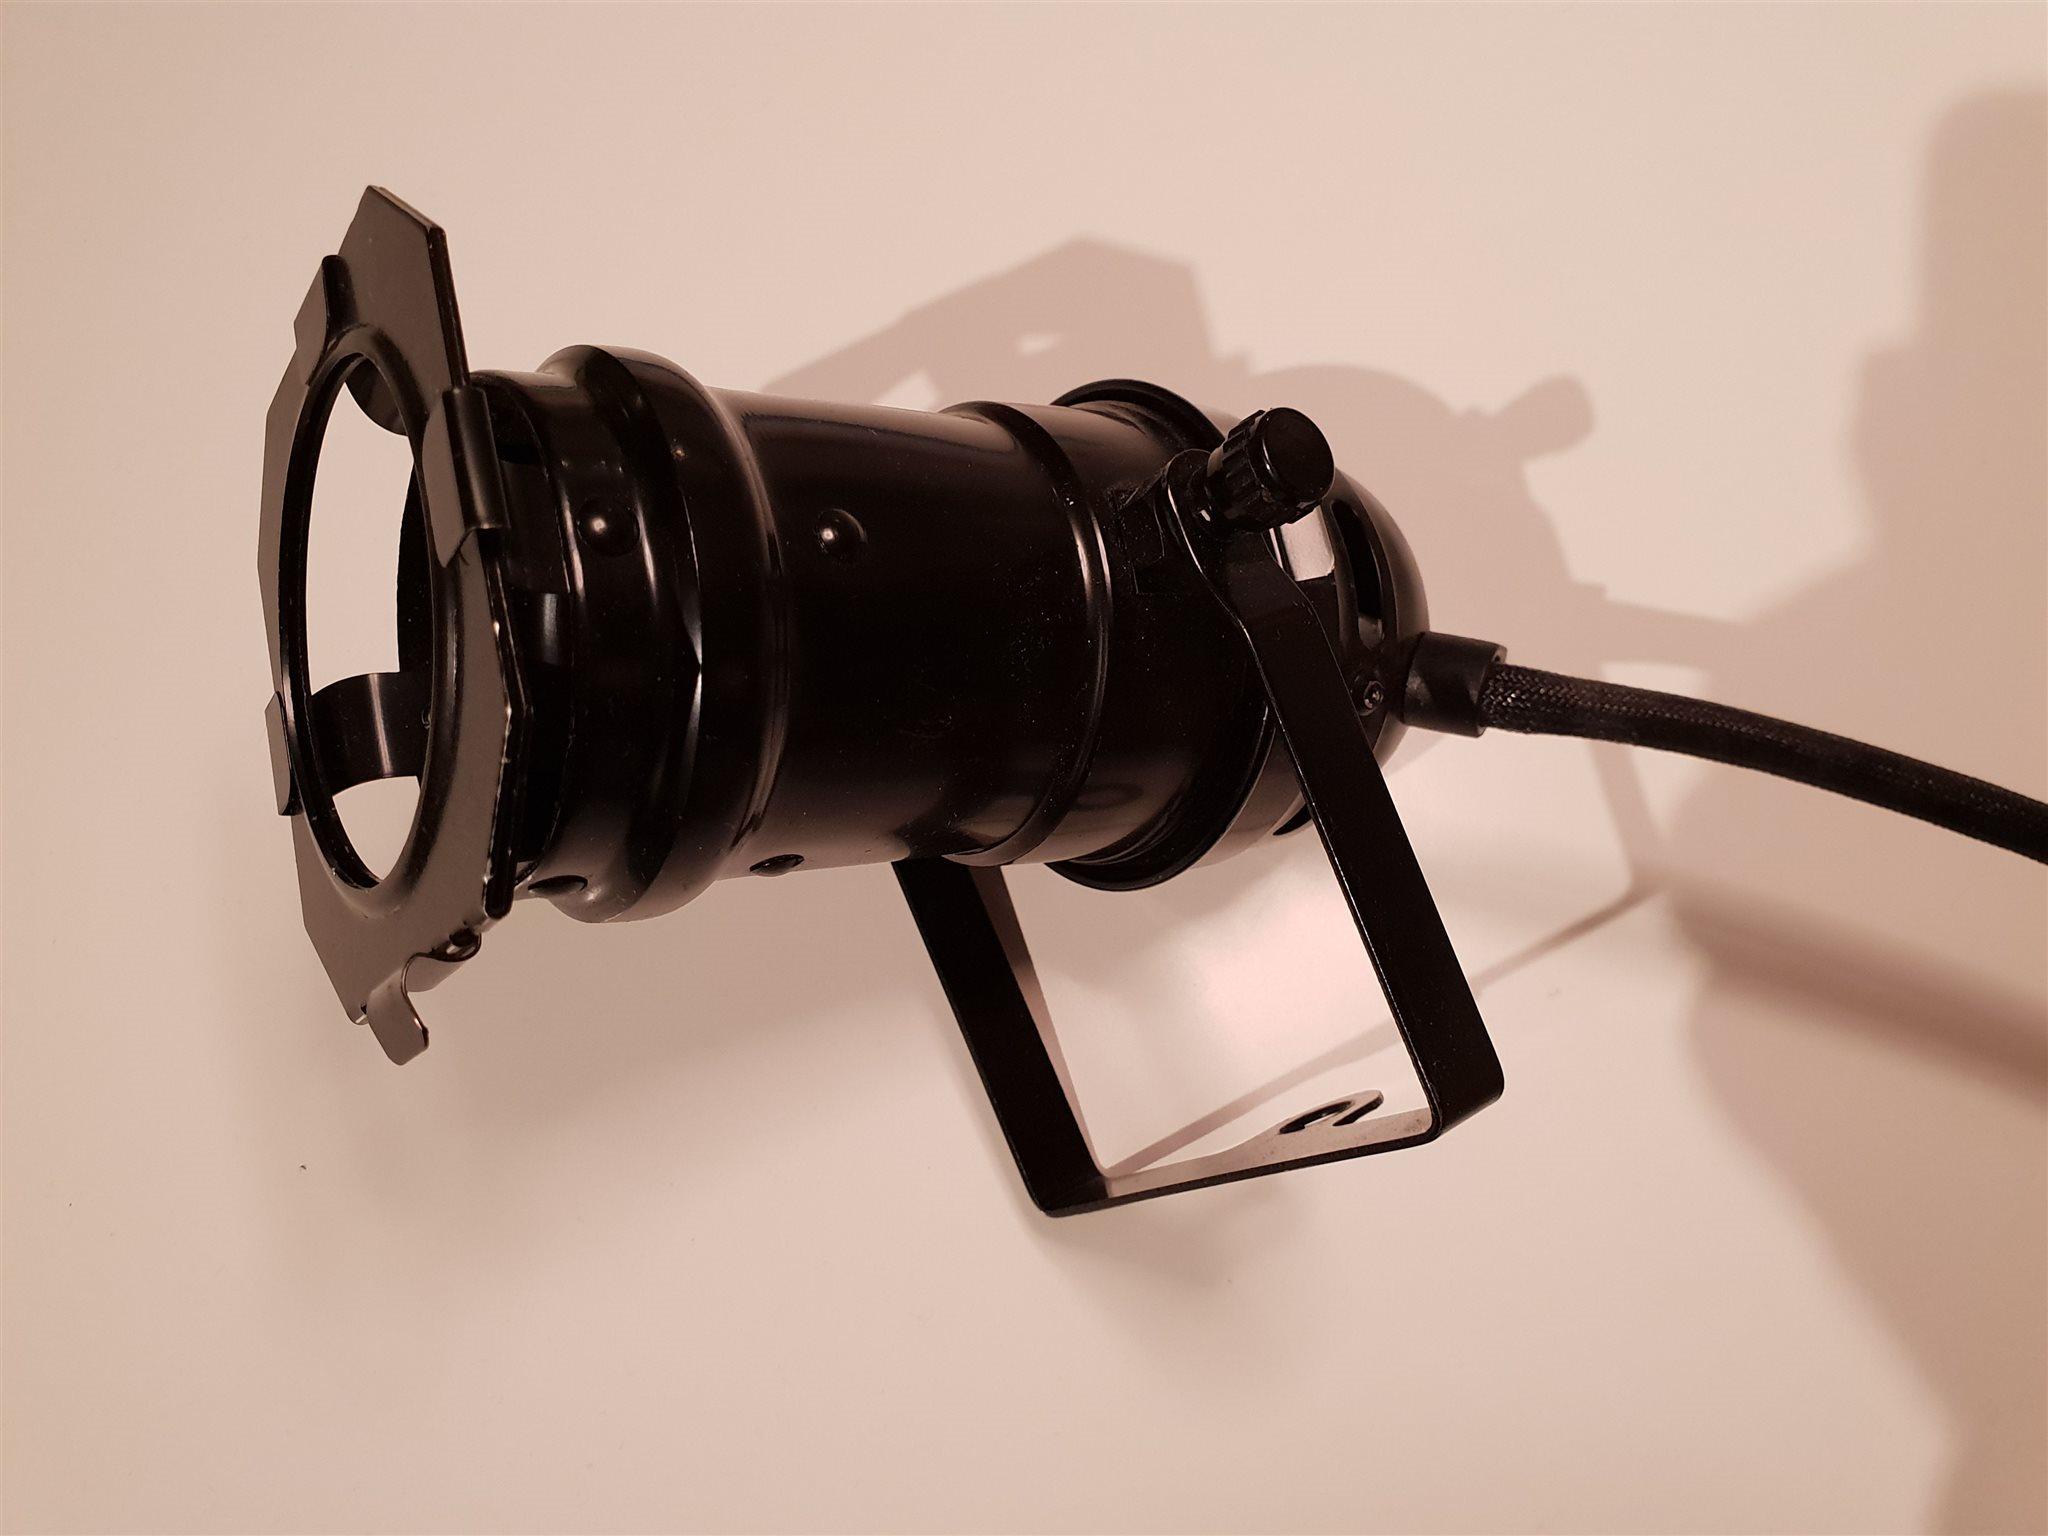 Klassisk Ultralite studiolampa, tidigt 90-tal